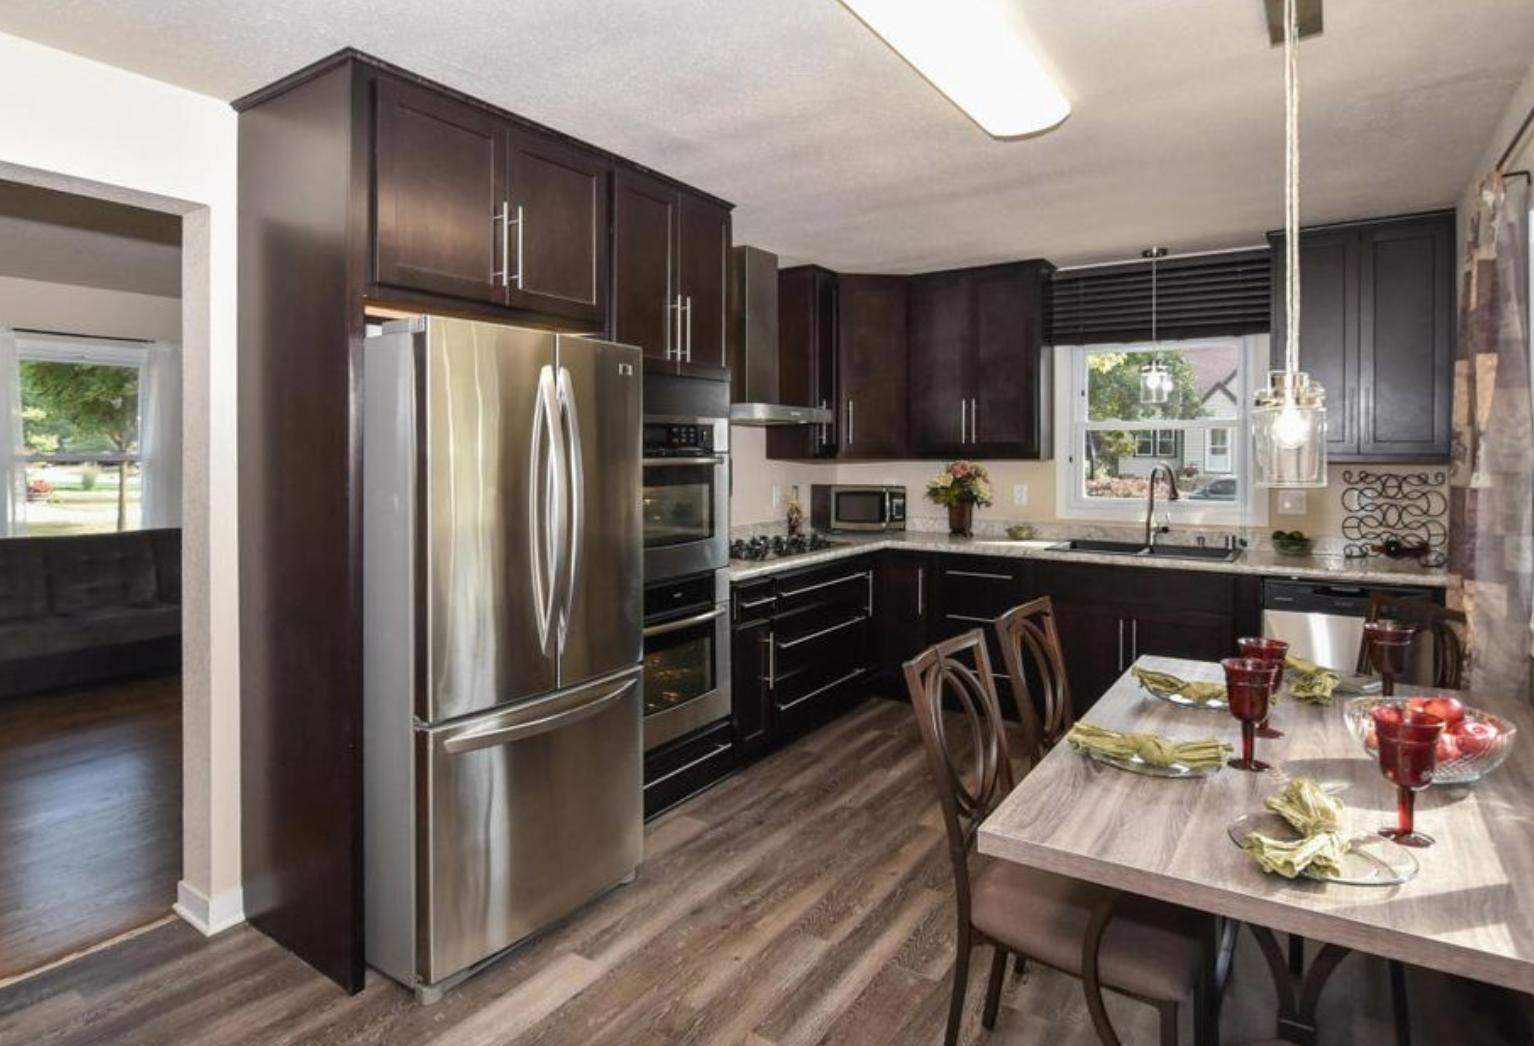 starter home average price